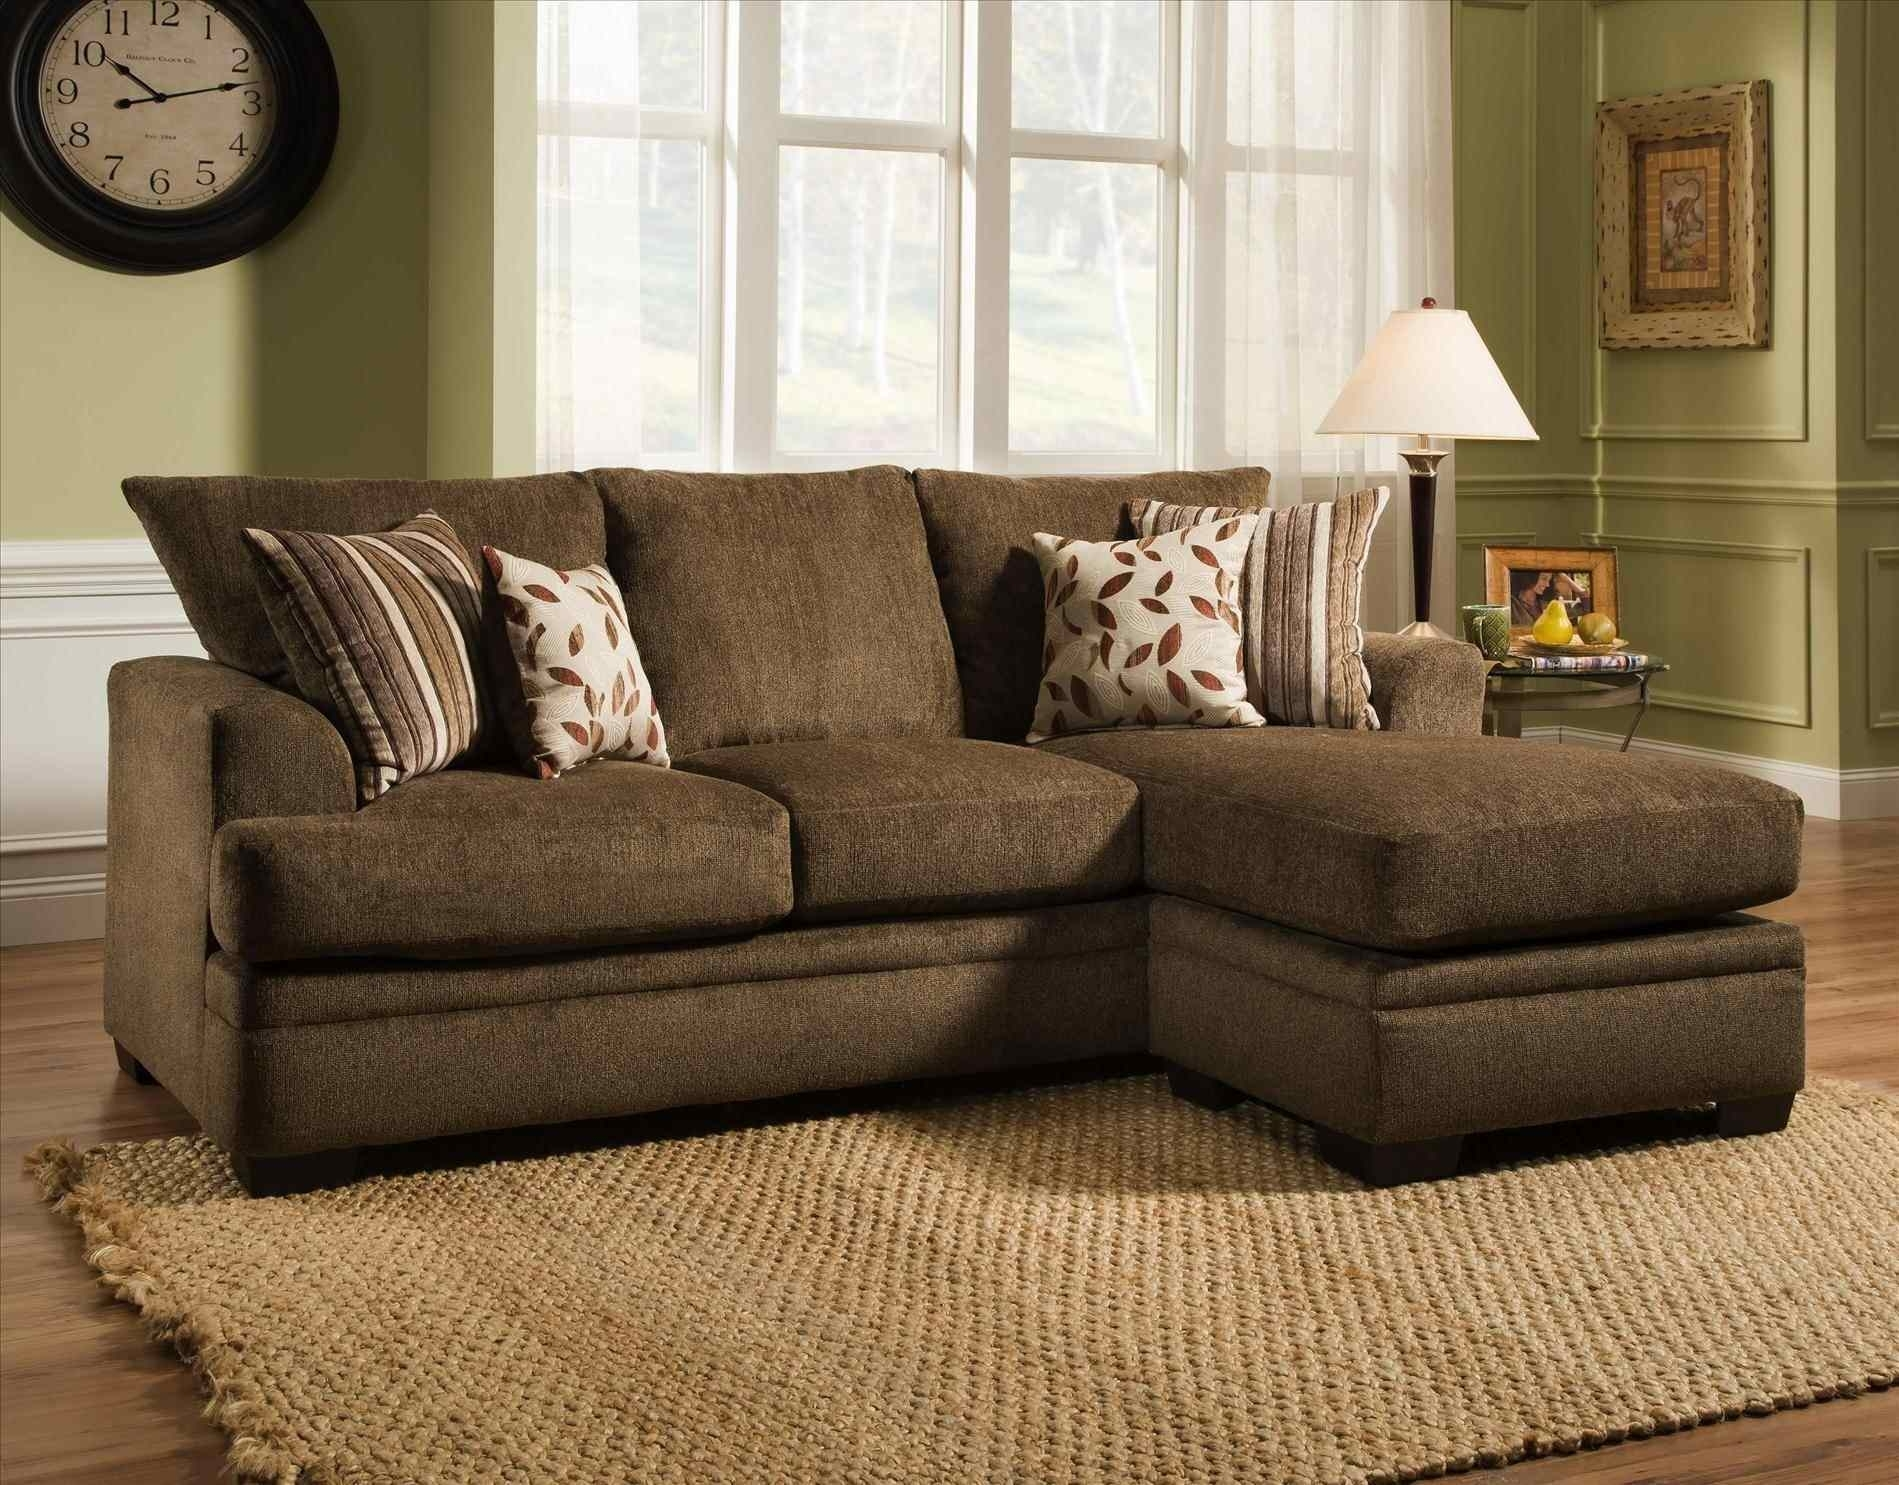 Sofa : Furniture Sofa Bernhardt Sectional Brilliant Brae Mathis Throughout Dayton Ohio Sectional Sofas (View 6 of 10)